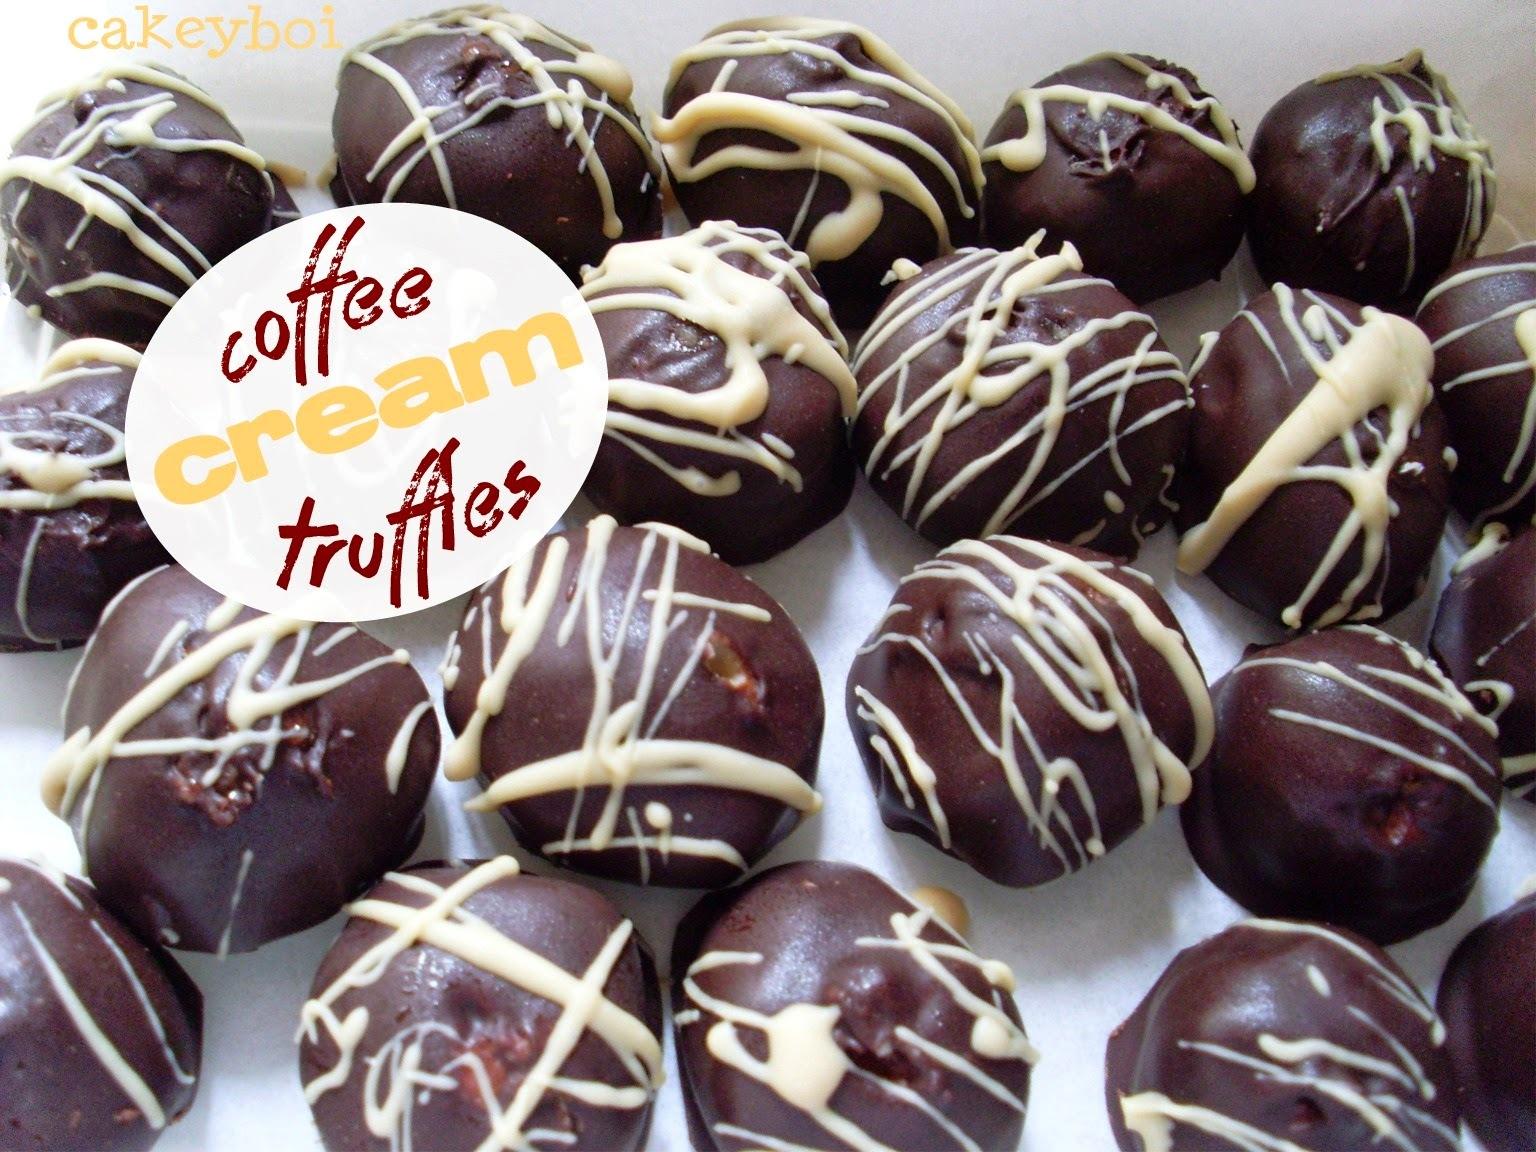 Coffee Cream Truffles